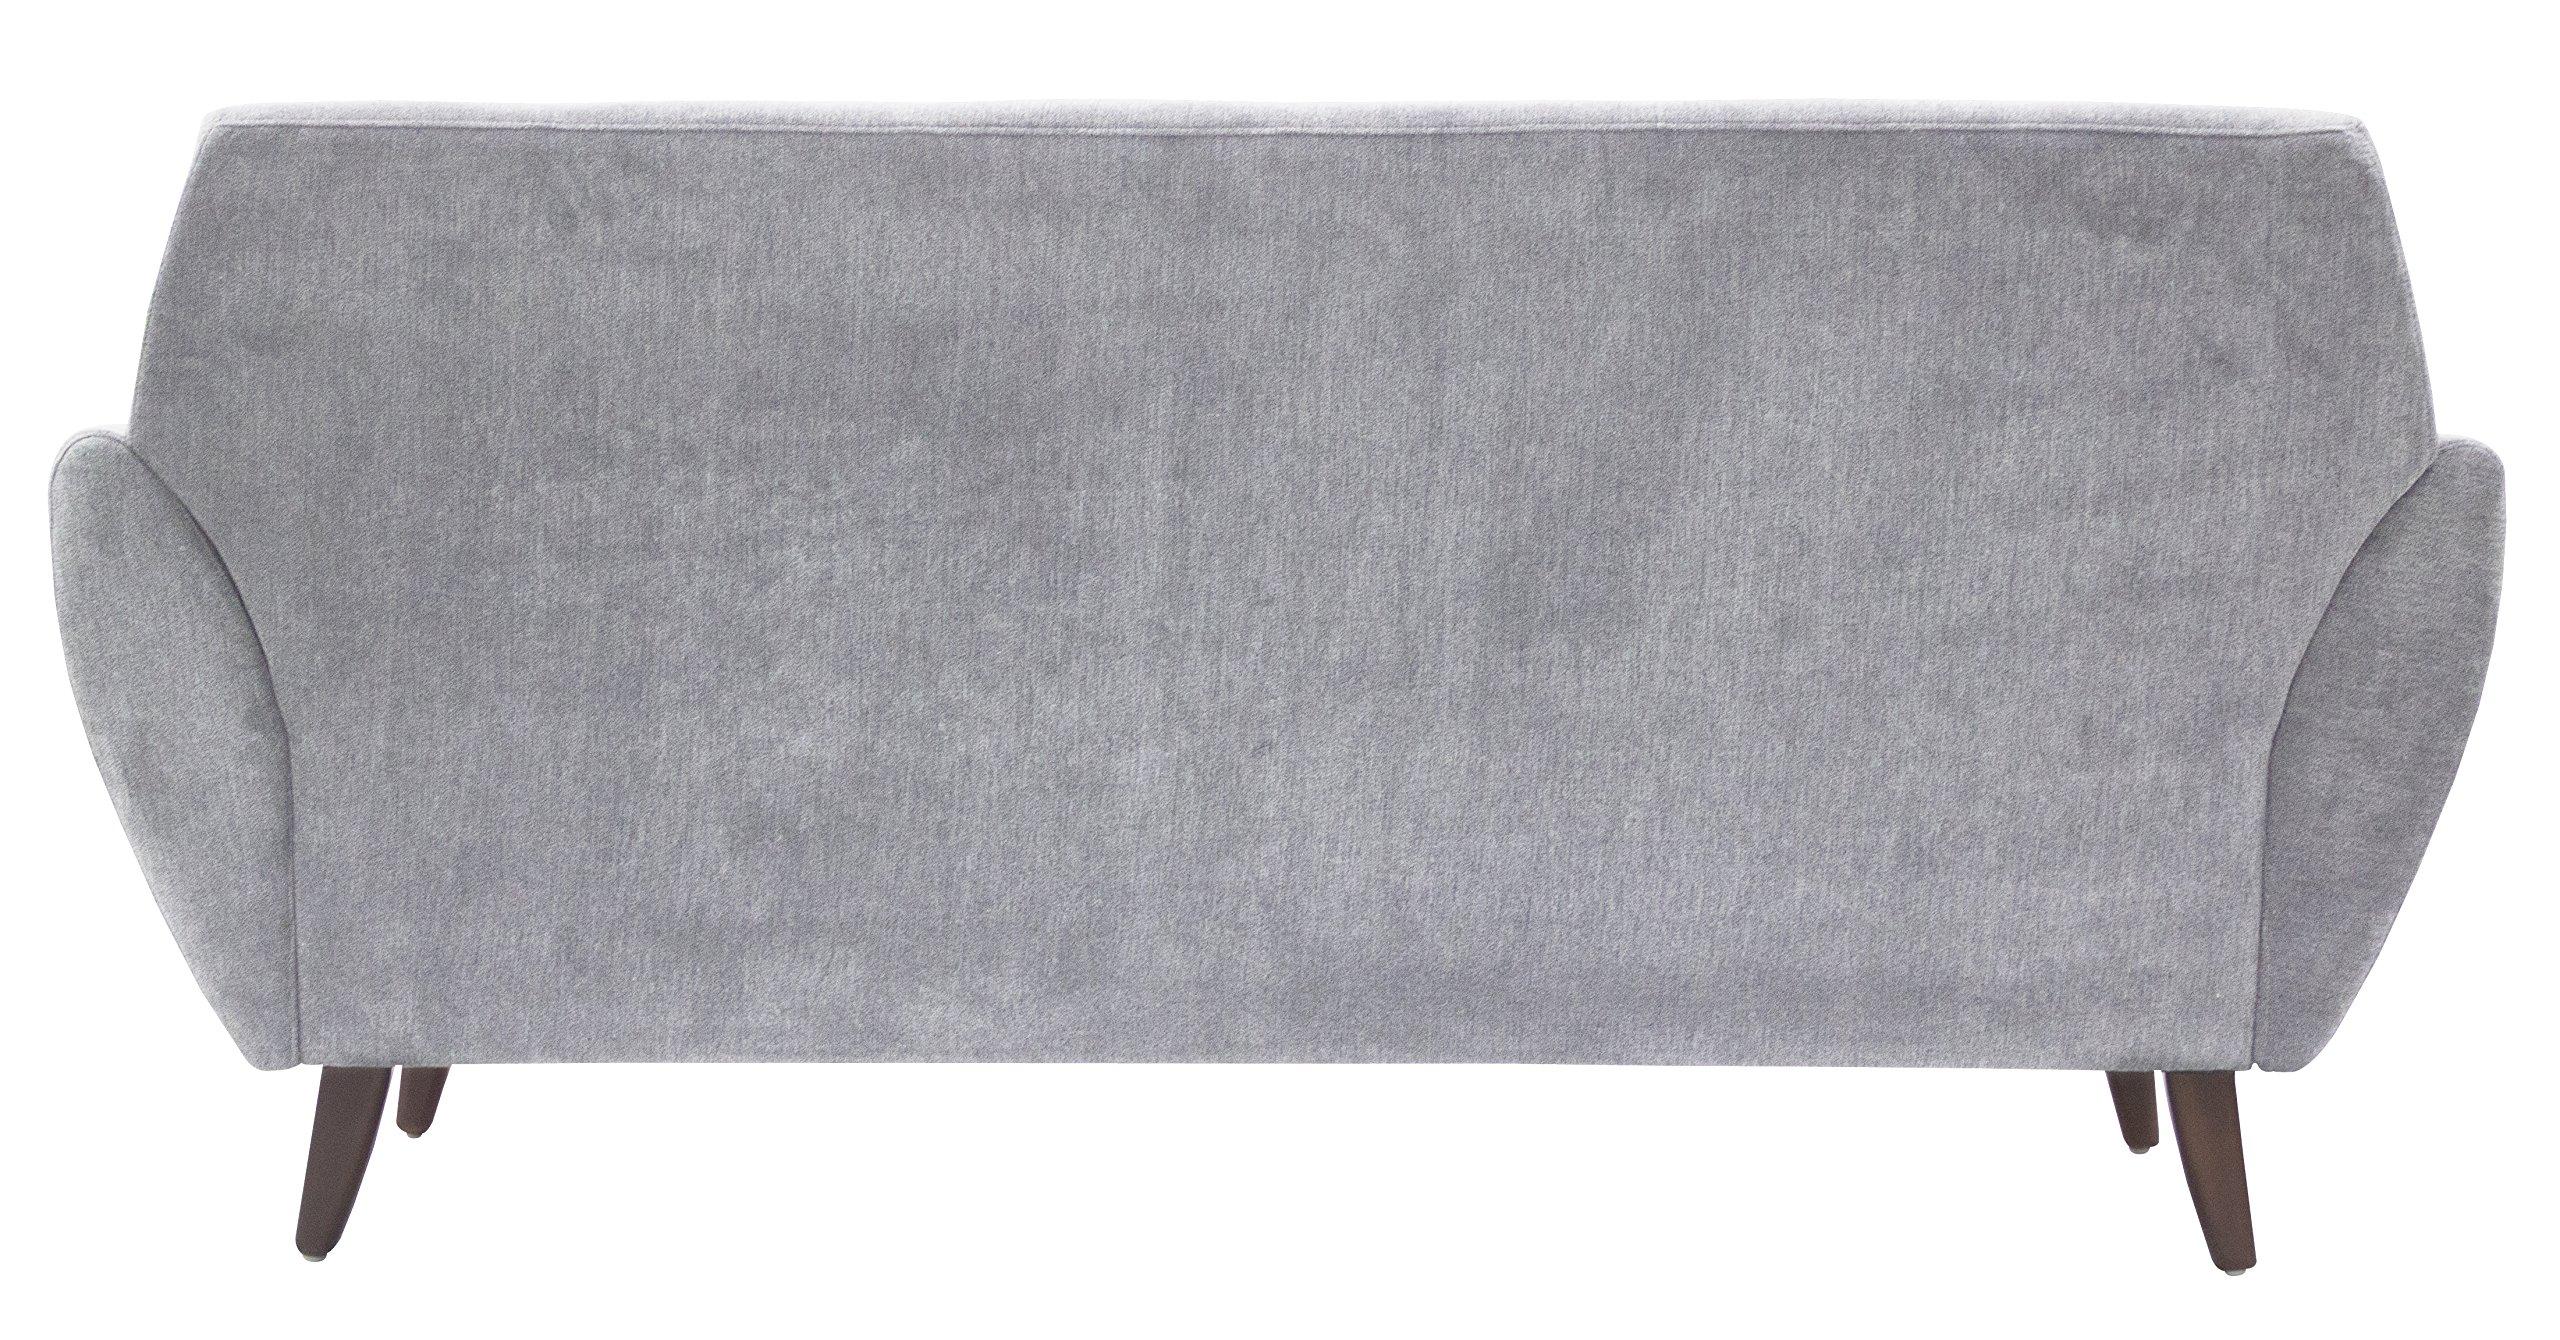 Serta Artesia Collection 61'' Loveseat in Smoke Gray by Serta (Image #5)